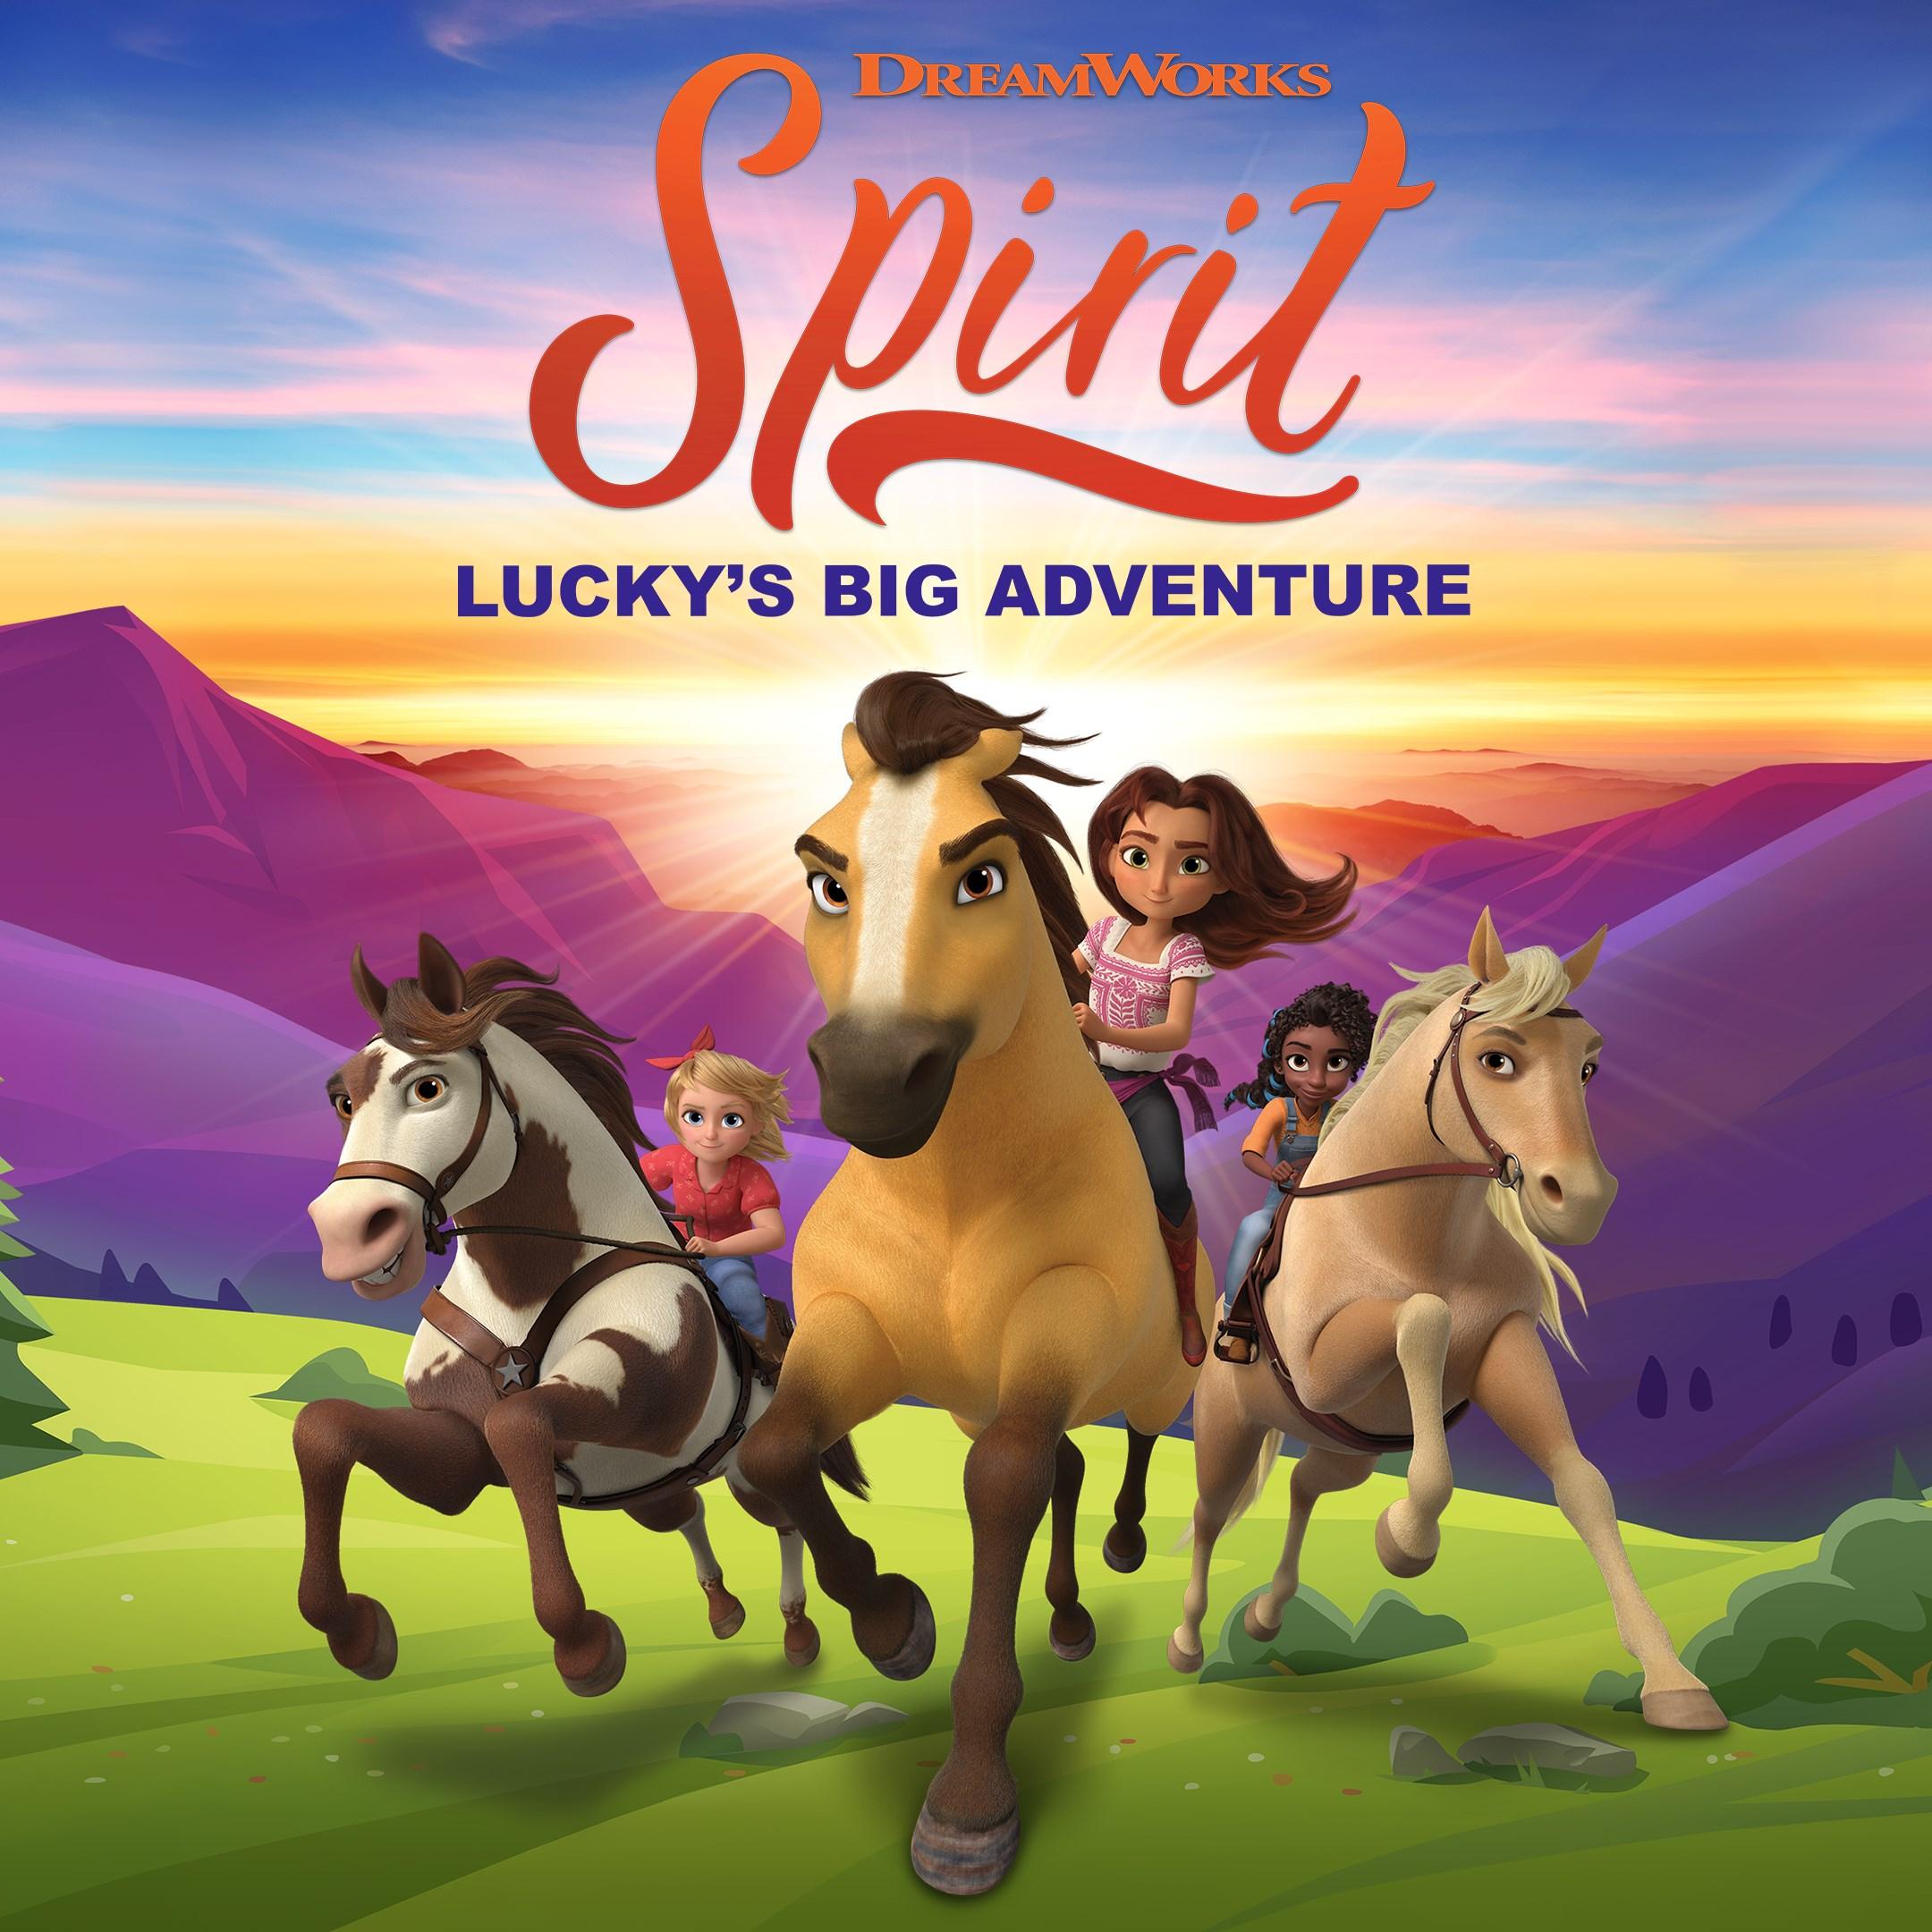 Image for DreamWorks Spirit Lucky's Big Adventure